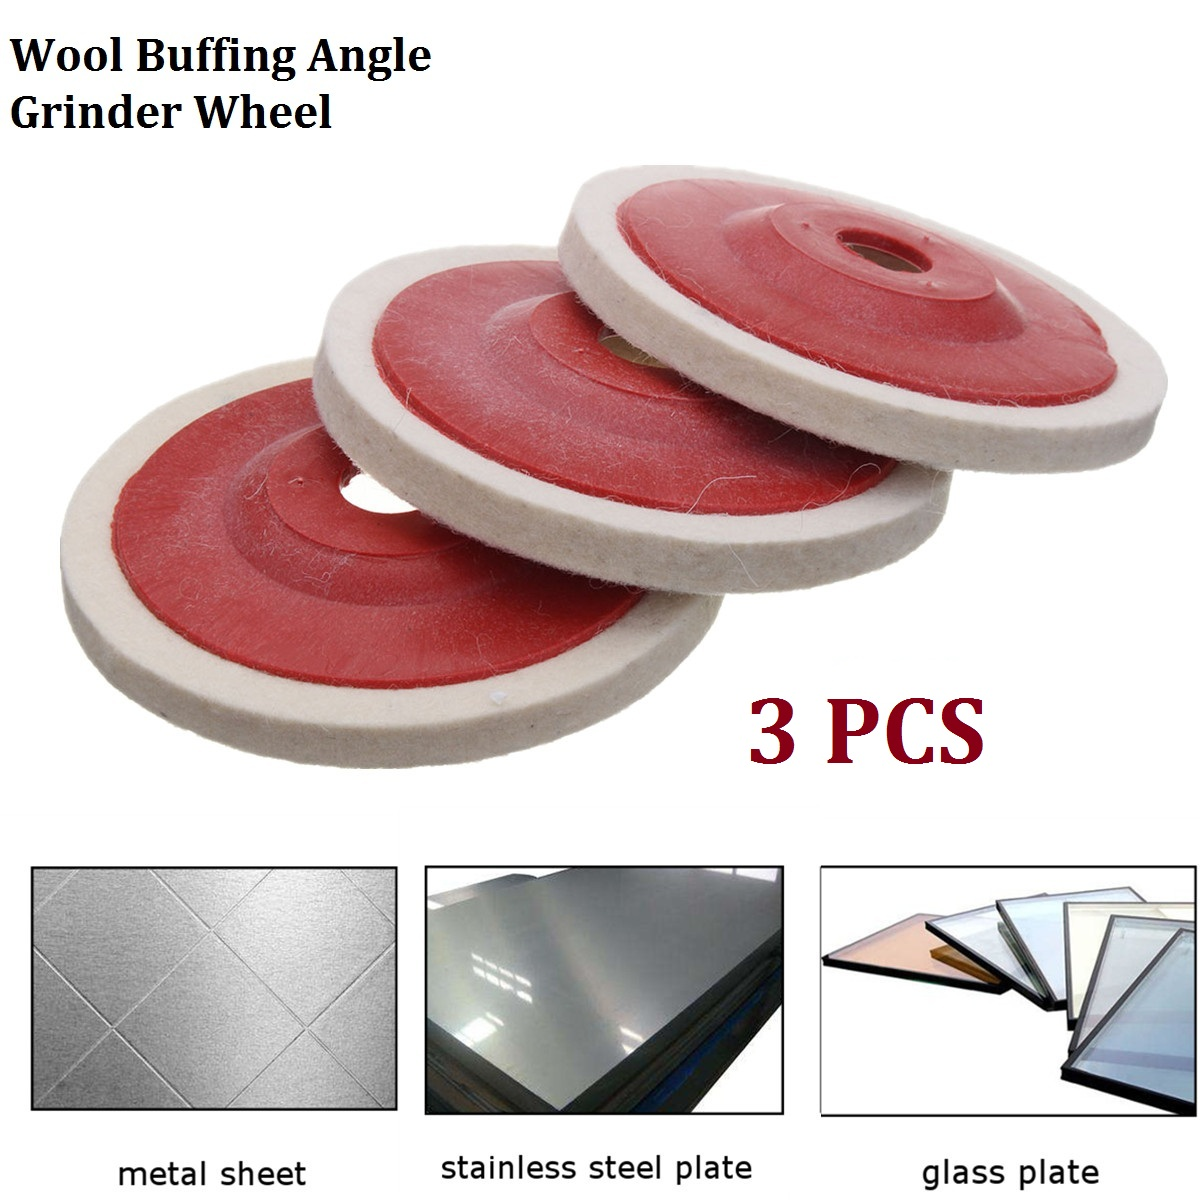 3pcs 100mm 4 Inch Wool Buffing Angle Grinder Wheel Felt Polishing Disc Pad Polishing Wheel